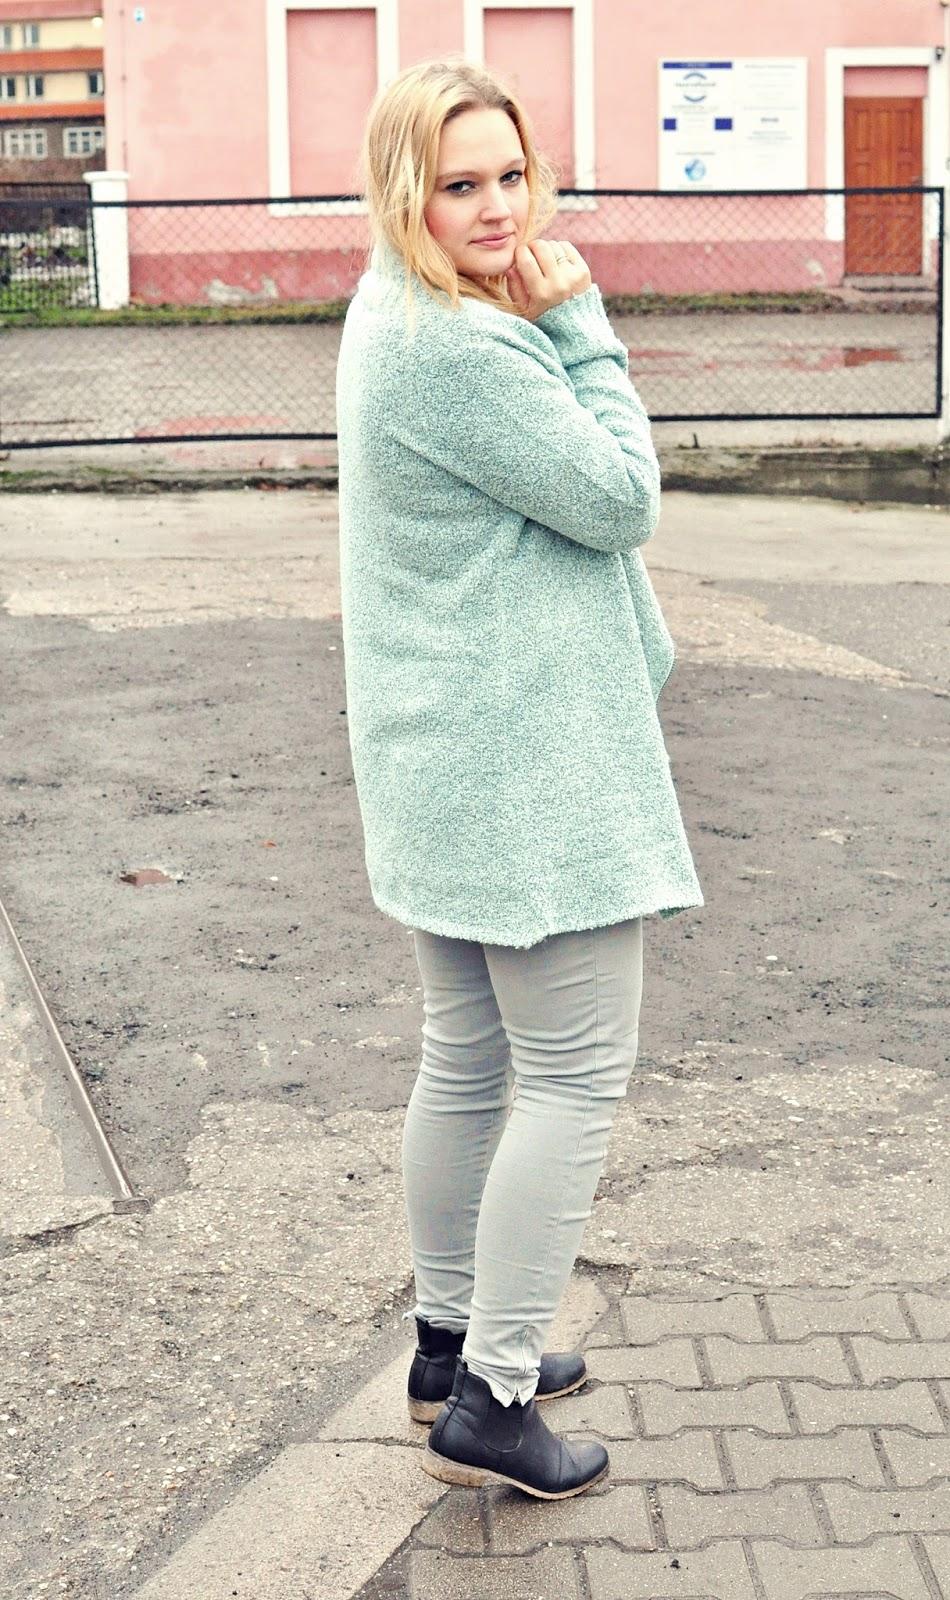 Kasia-blogerka